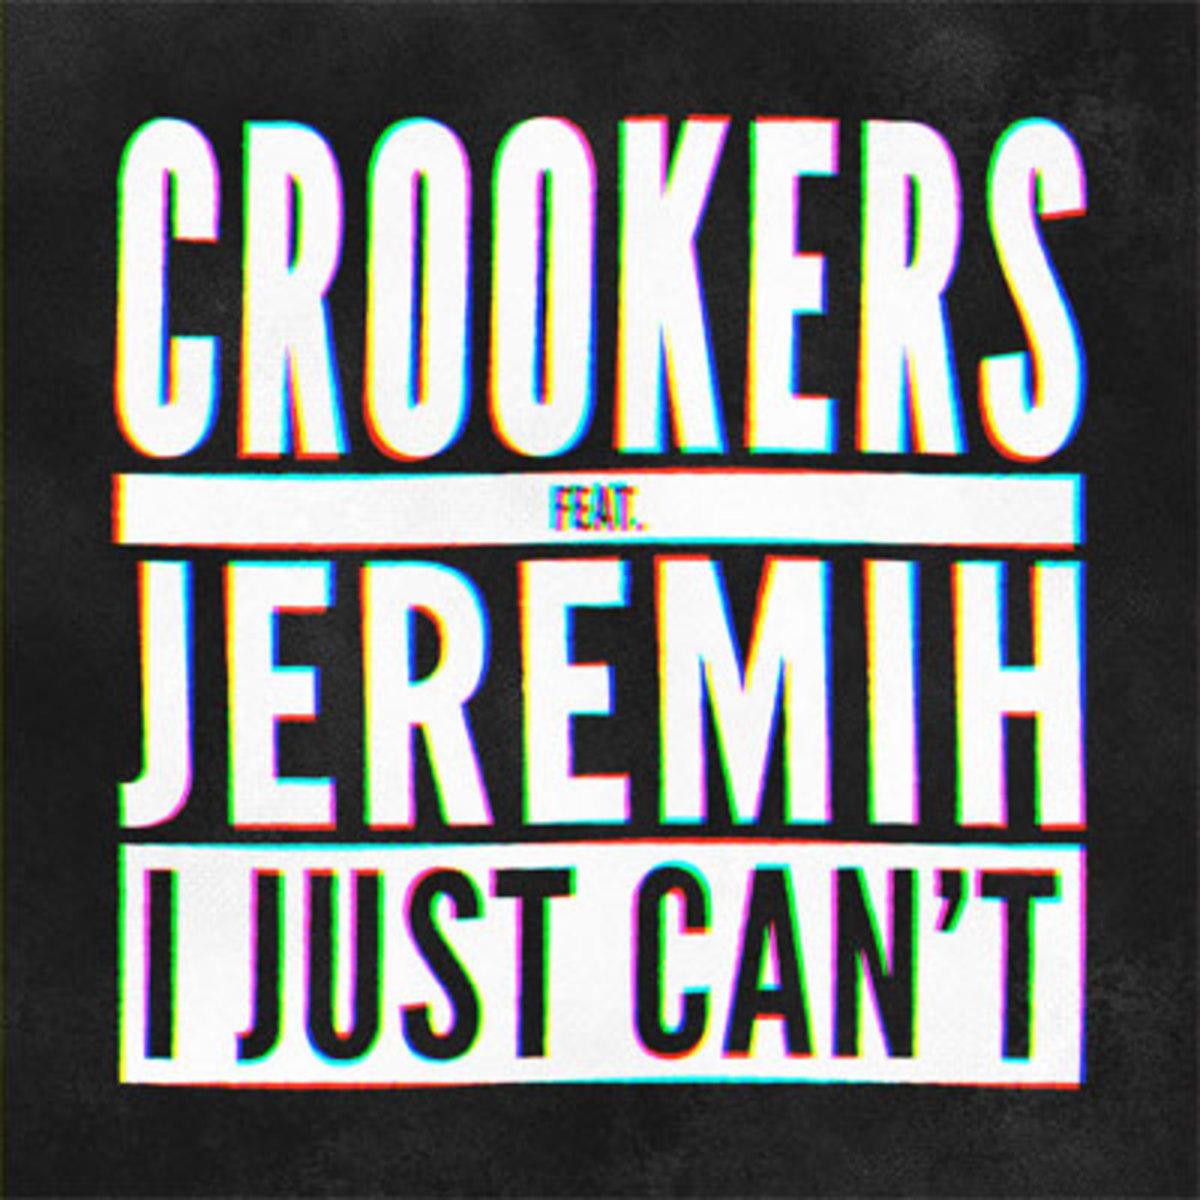 crookers-ijustcant.jpg